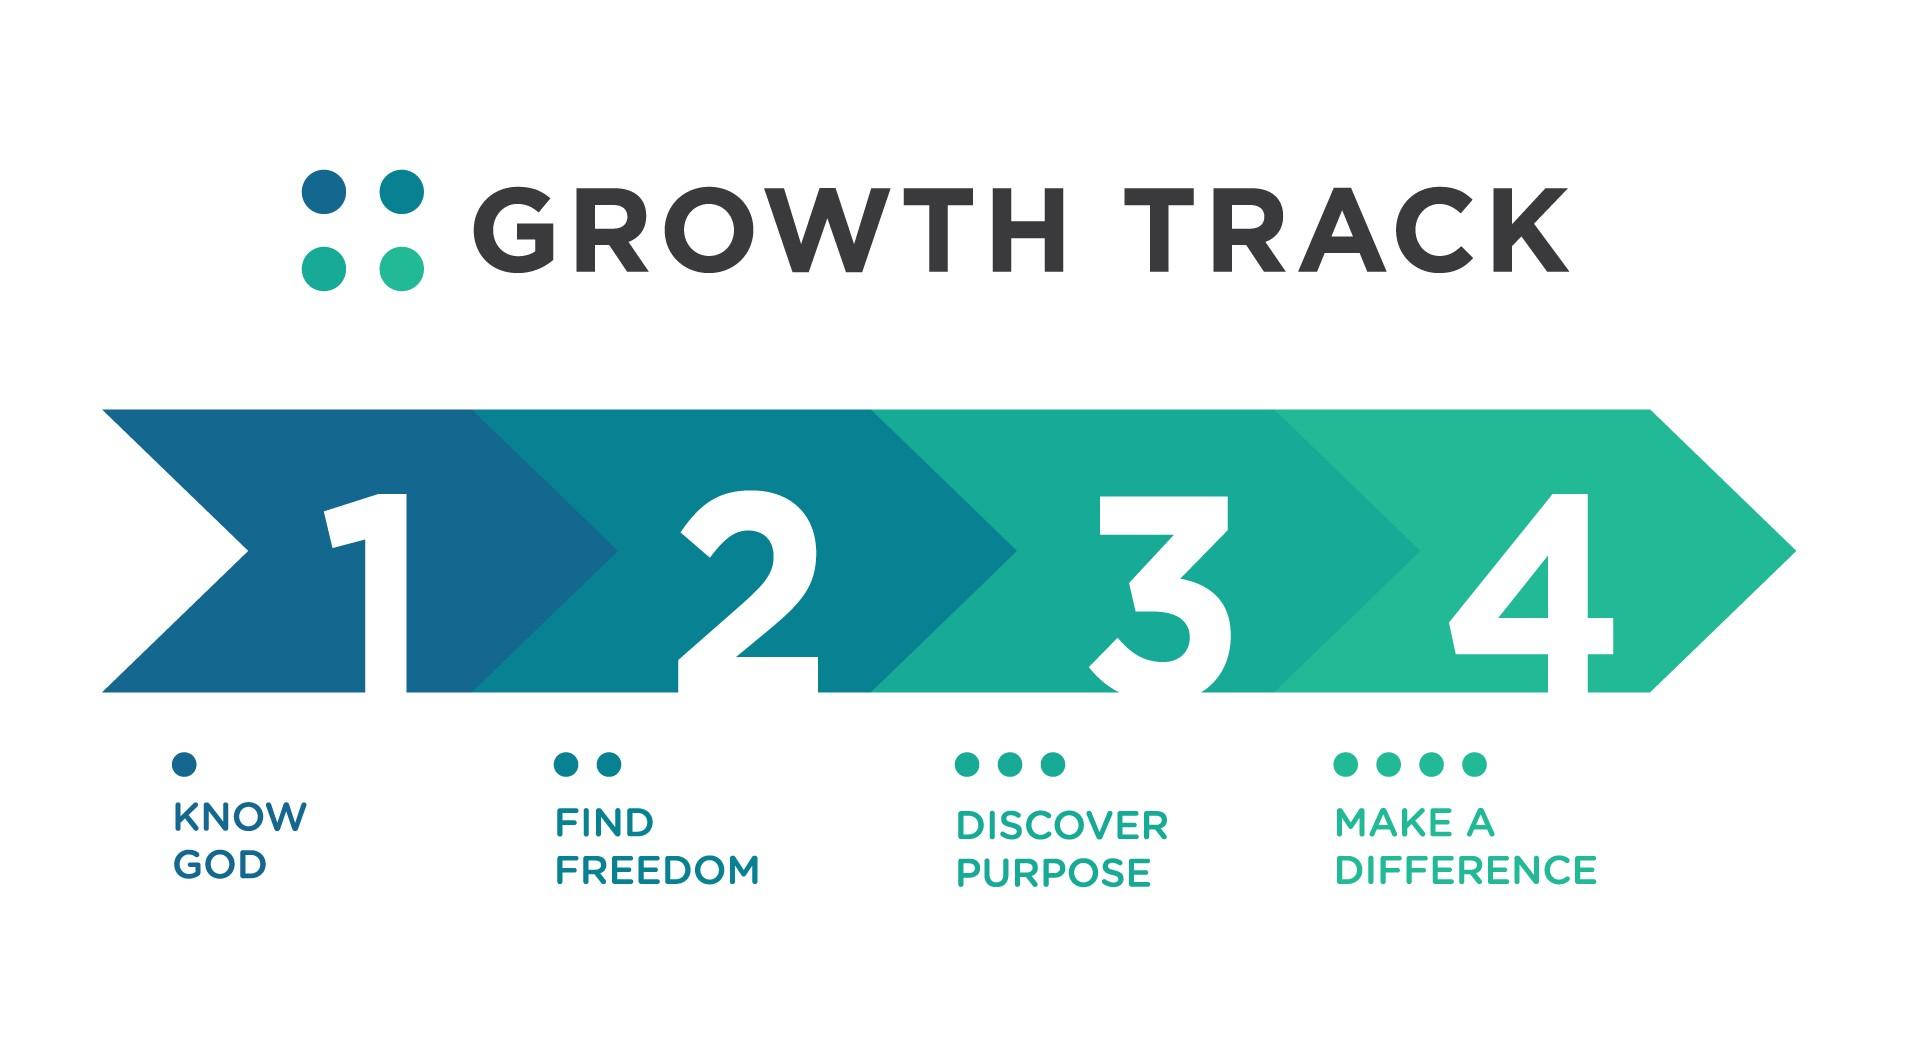 Growth track 3